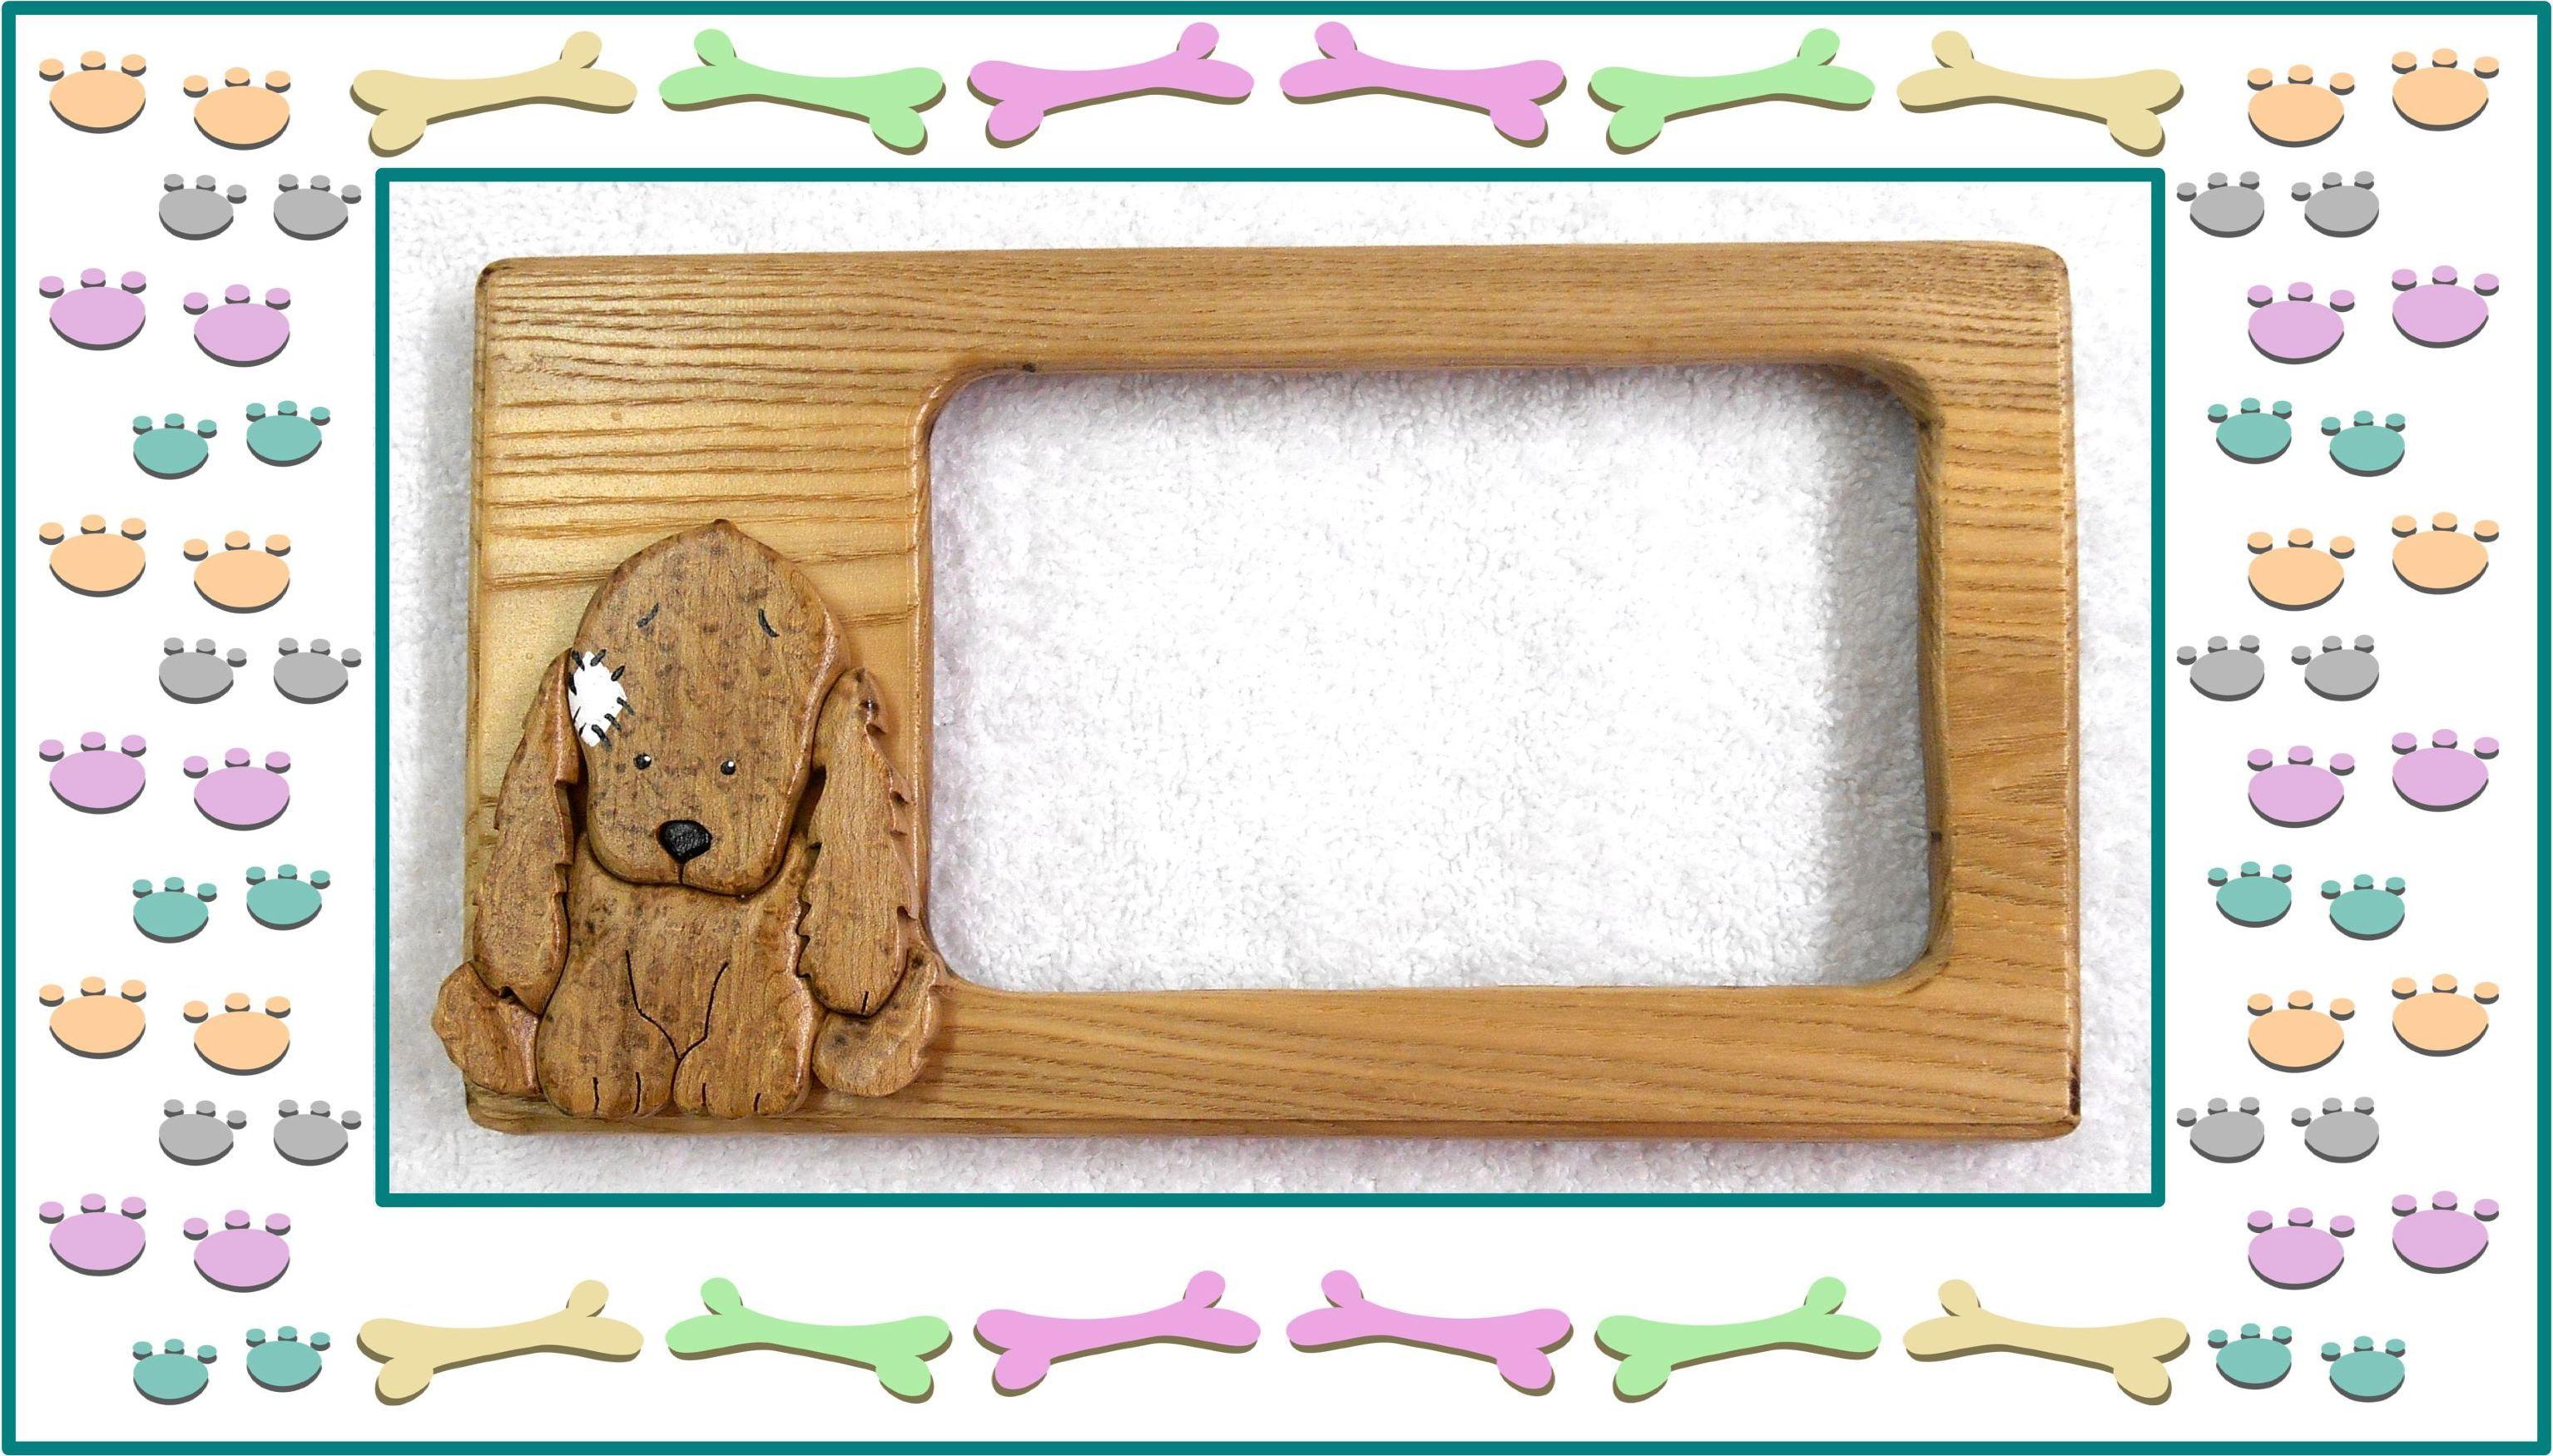 Cute little puppy frame. keoriscustomwoodworking.com